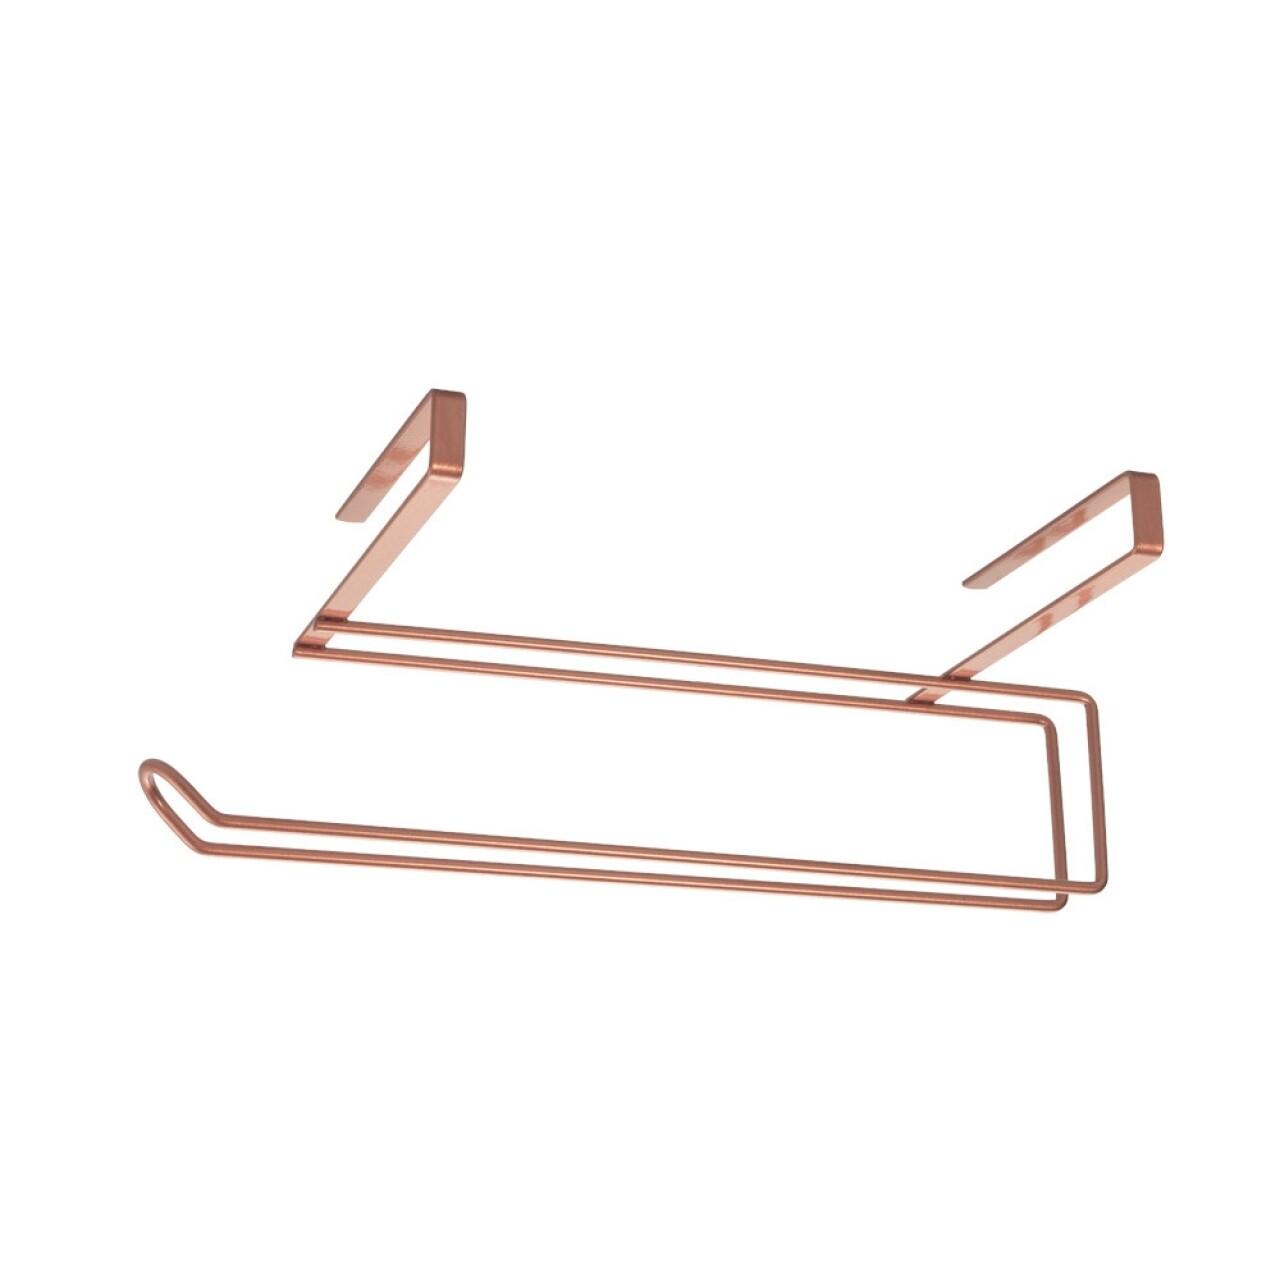 Suport prosoape pentru dulap Undershelf Copper, Metaltex,  10 x 18 x 35 cm,  inox/invelis Polytherm, cupru